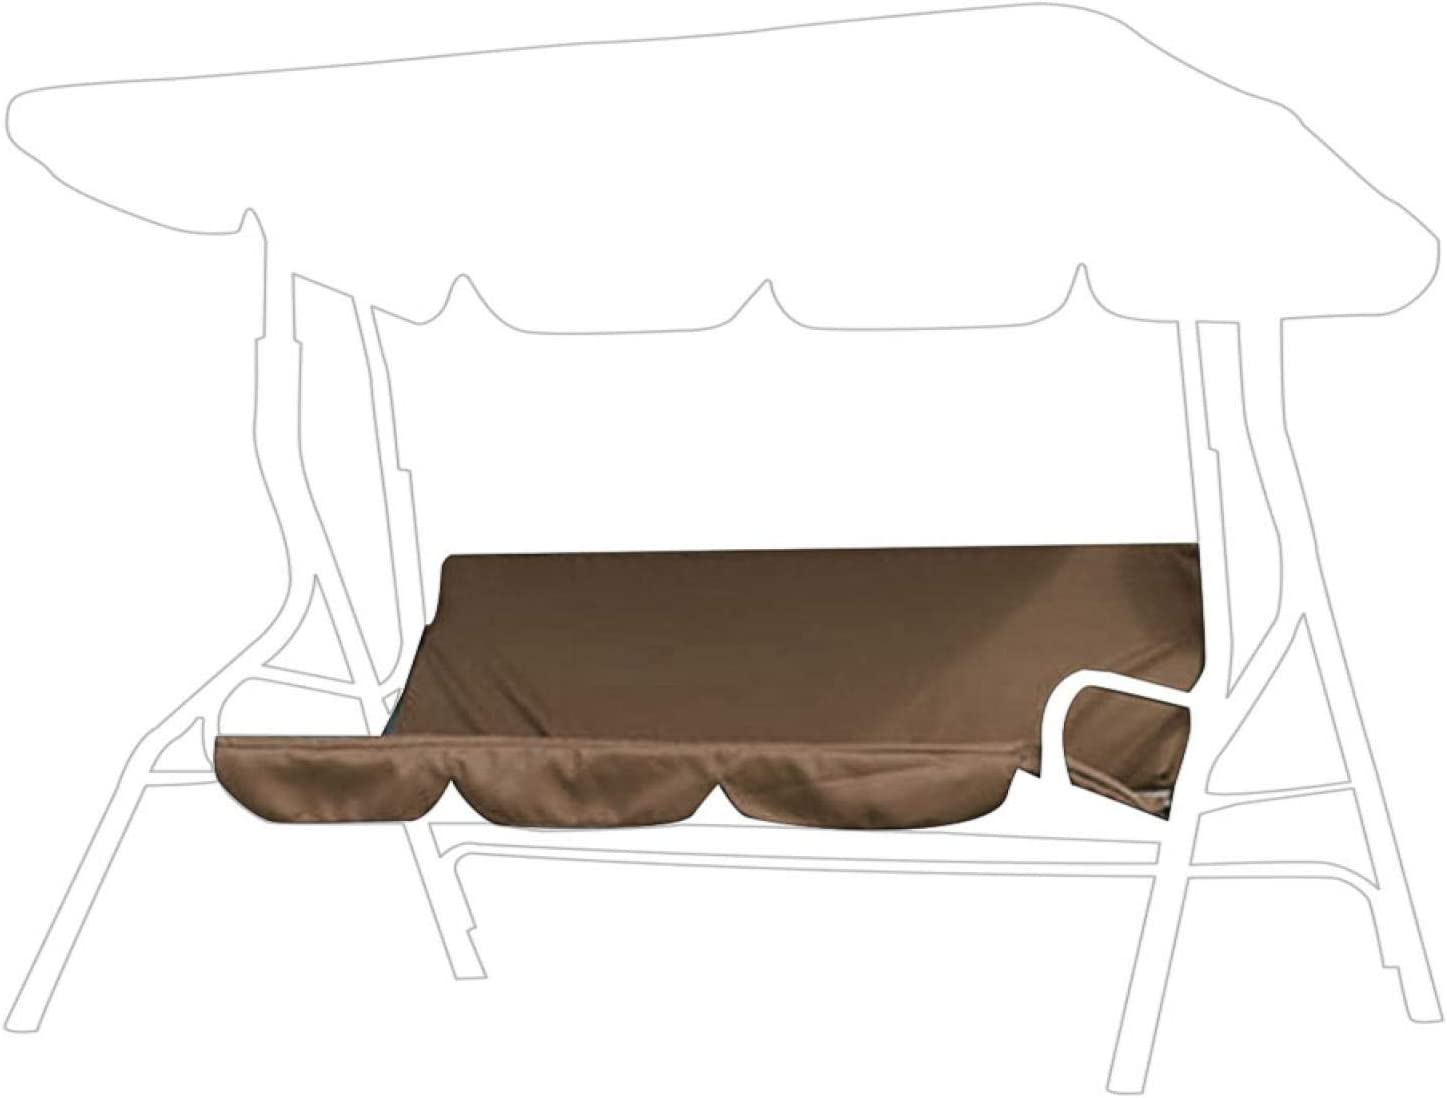 Jenngaoo Patio Swing Cushion Cover, Waterproof Swing Hammock 3‑Seat Cushion Cover Benc-h Cushion Covers Chair Protection for Courtyard Garden Outdoor - 150x50x10cm(Brown)